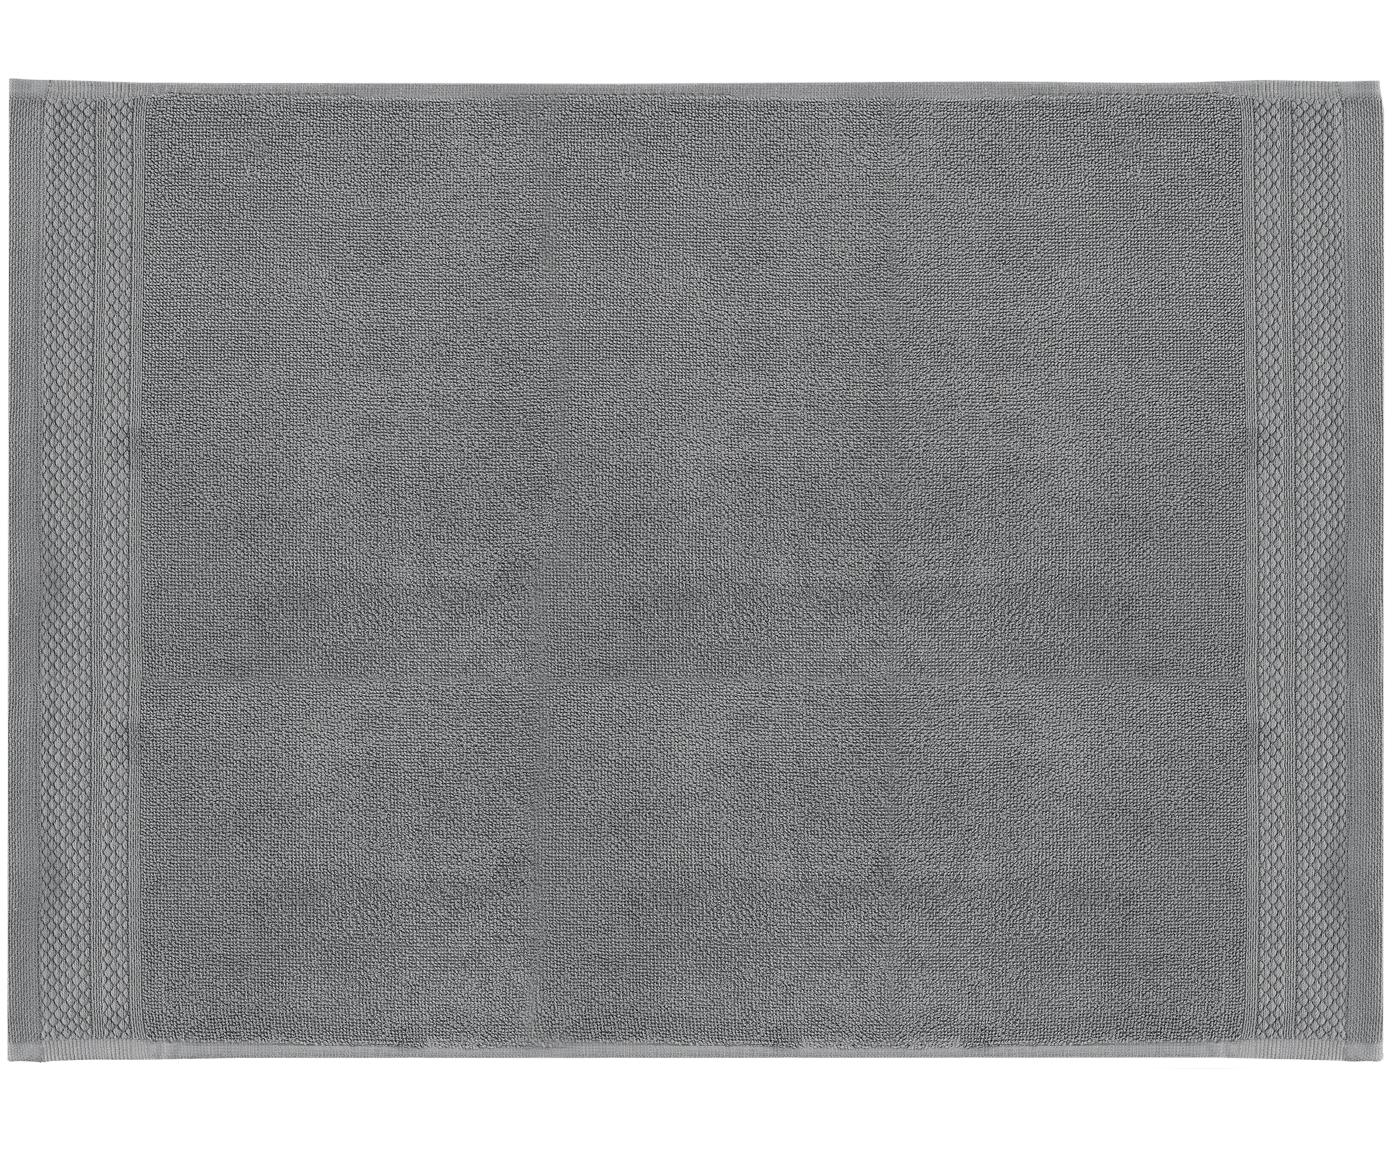 Badmat Premium, 100% katoen, zware kwaliteit, 600 g/m², Donkergrijs, 50 x 70 cm